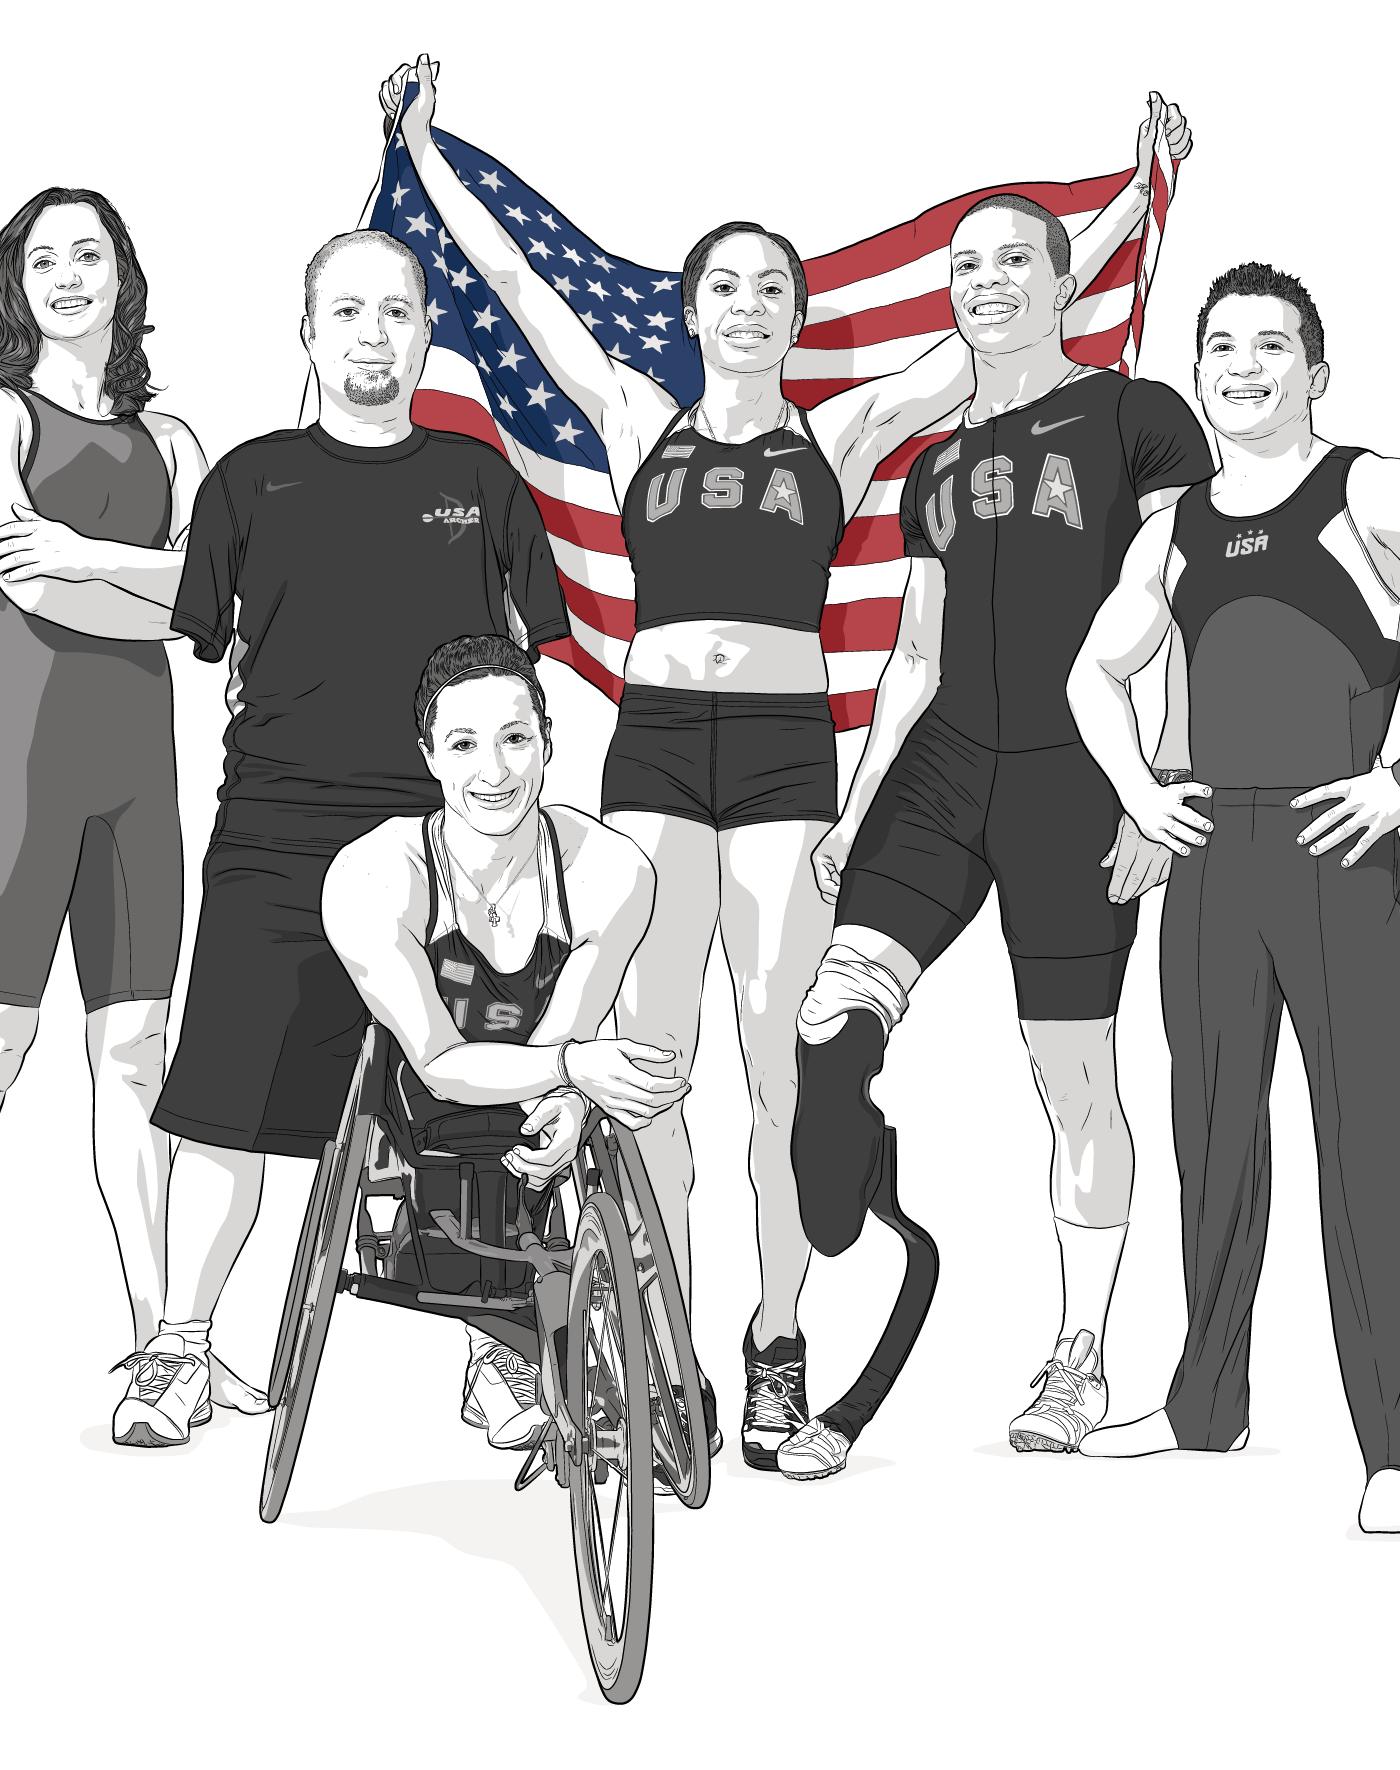 BP's Team USA Athletes pose, illustration by Max Hancock